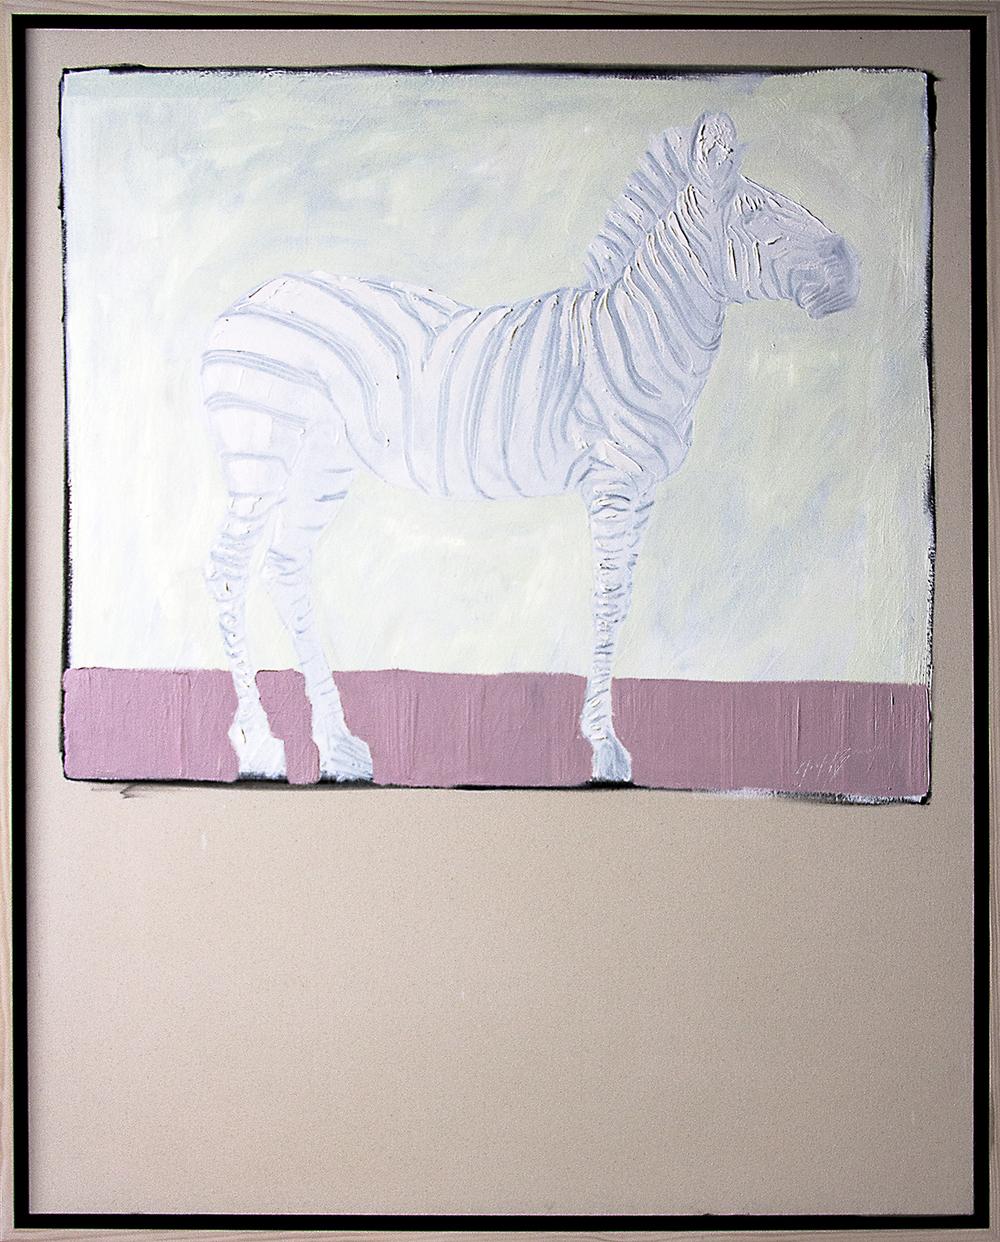 White Stripes, 48x60